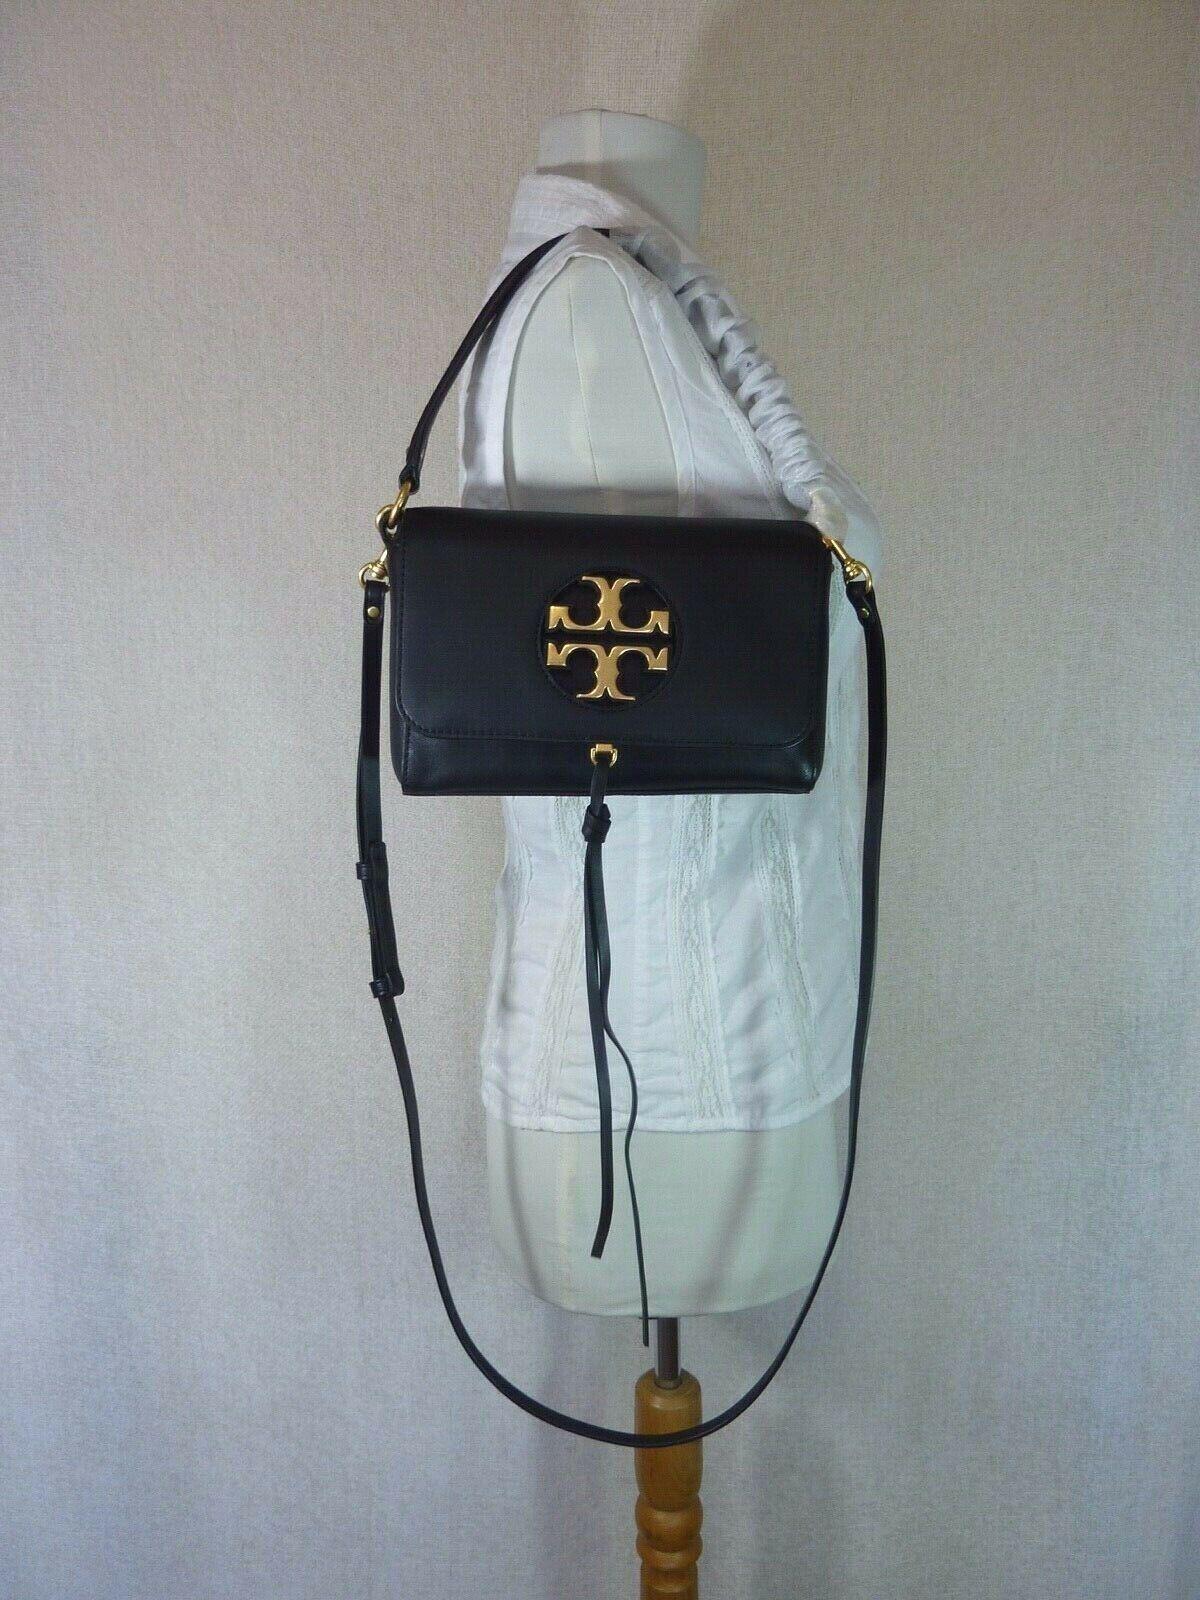 NWT Tory Burch Black Leather Miller Metal Cross-Body Bag/Mini Shoulder Bag $398